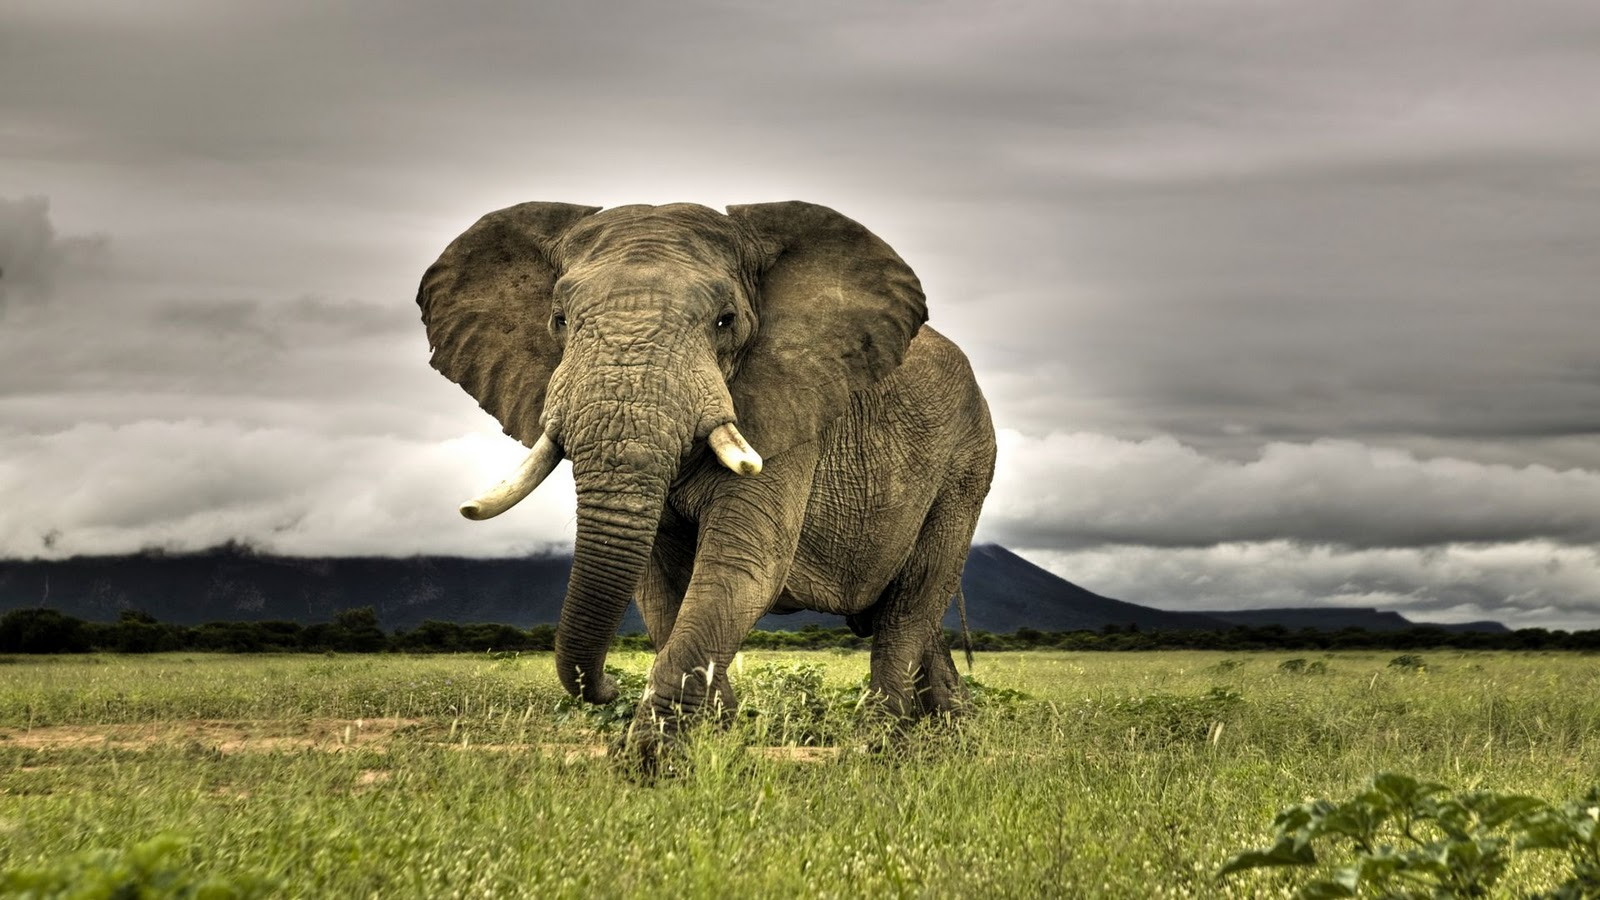 http://2.bp.blogspot.com/-qpGtZjHOrRI/TxfXa8LbLJI/AAAAAAAAAkI/QuLqHxgo3Kw/s1600/Elephant-WildLife%2B-Wallpaper-HDTV-1080p.jpg